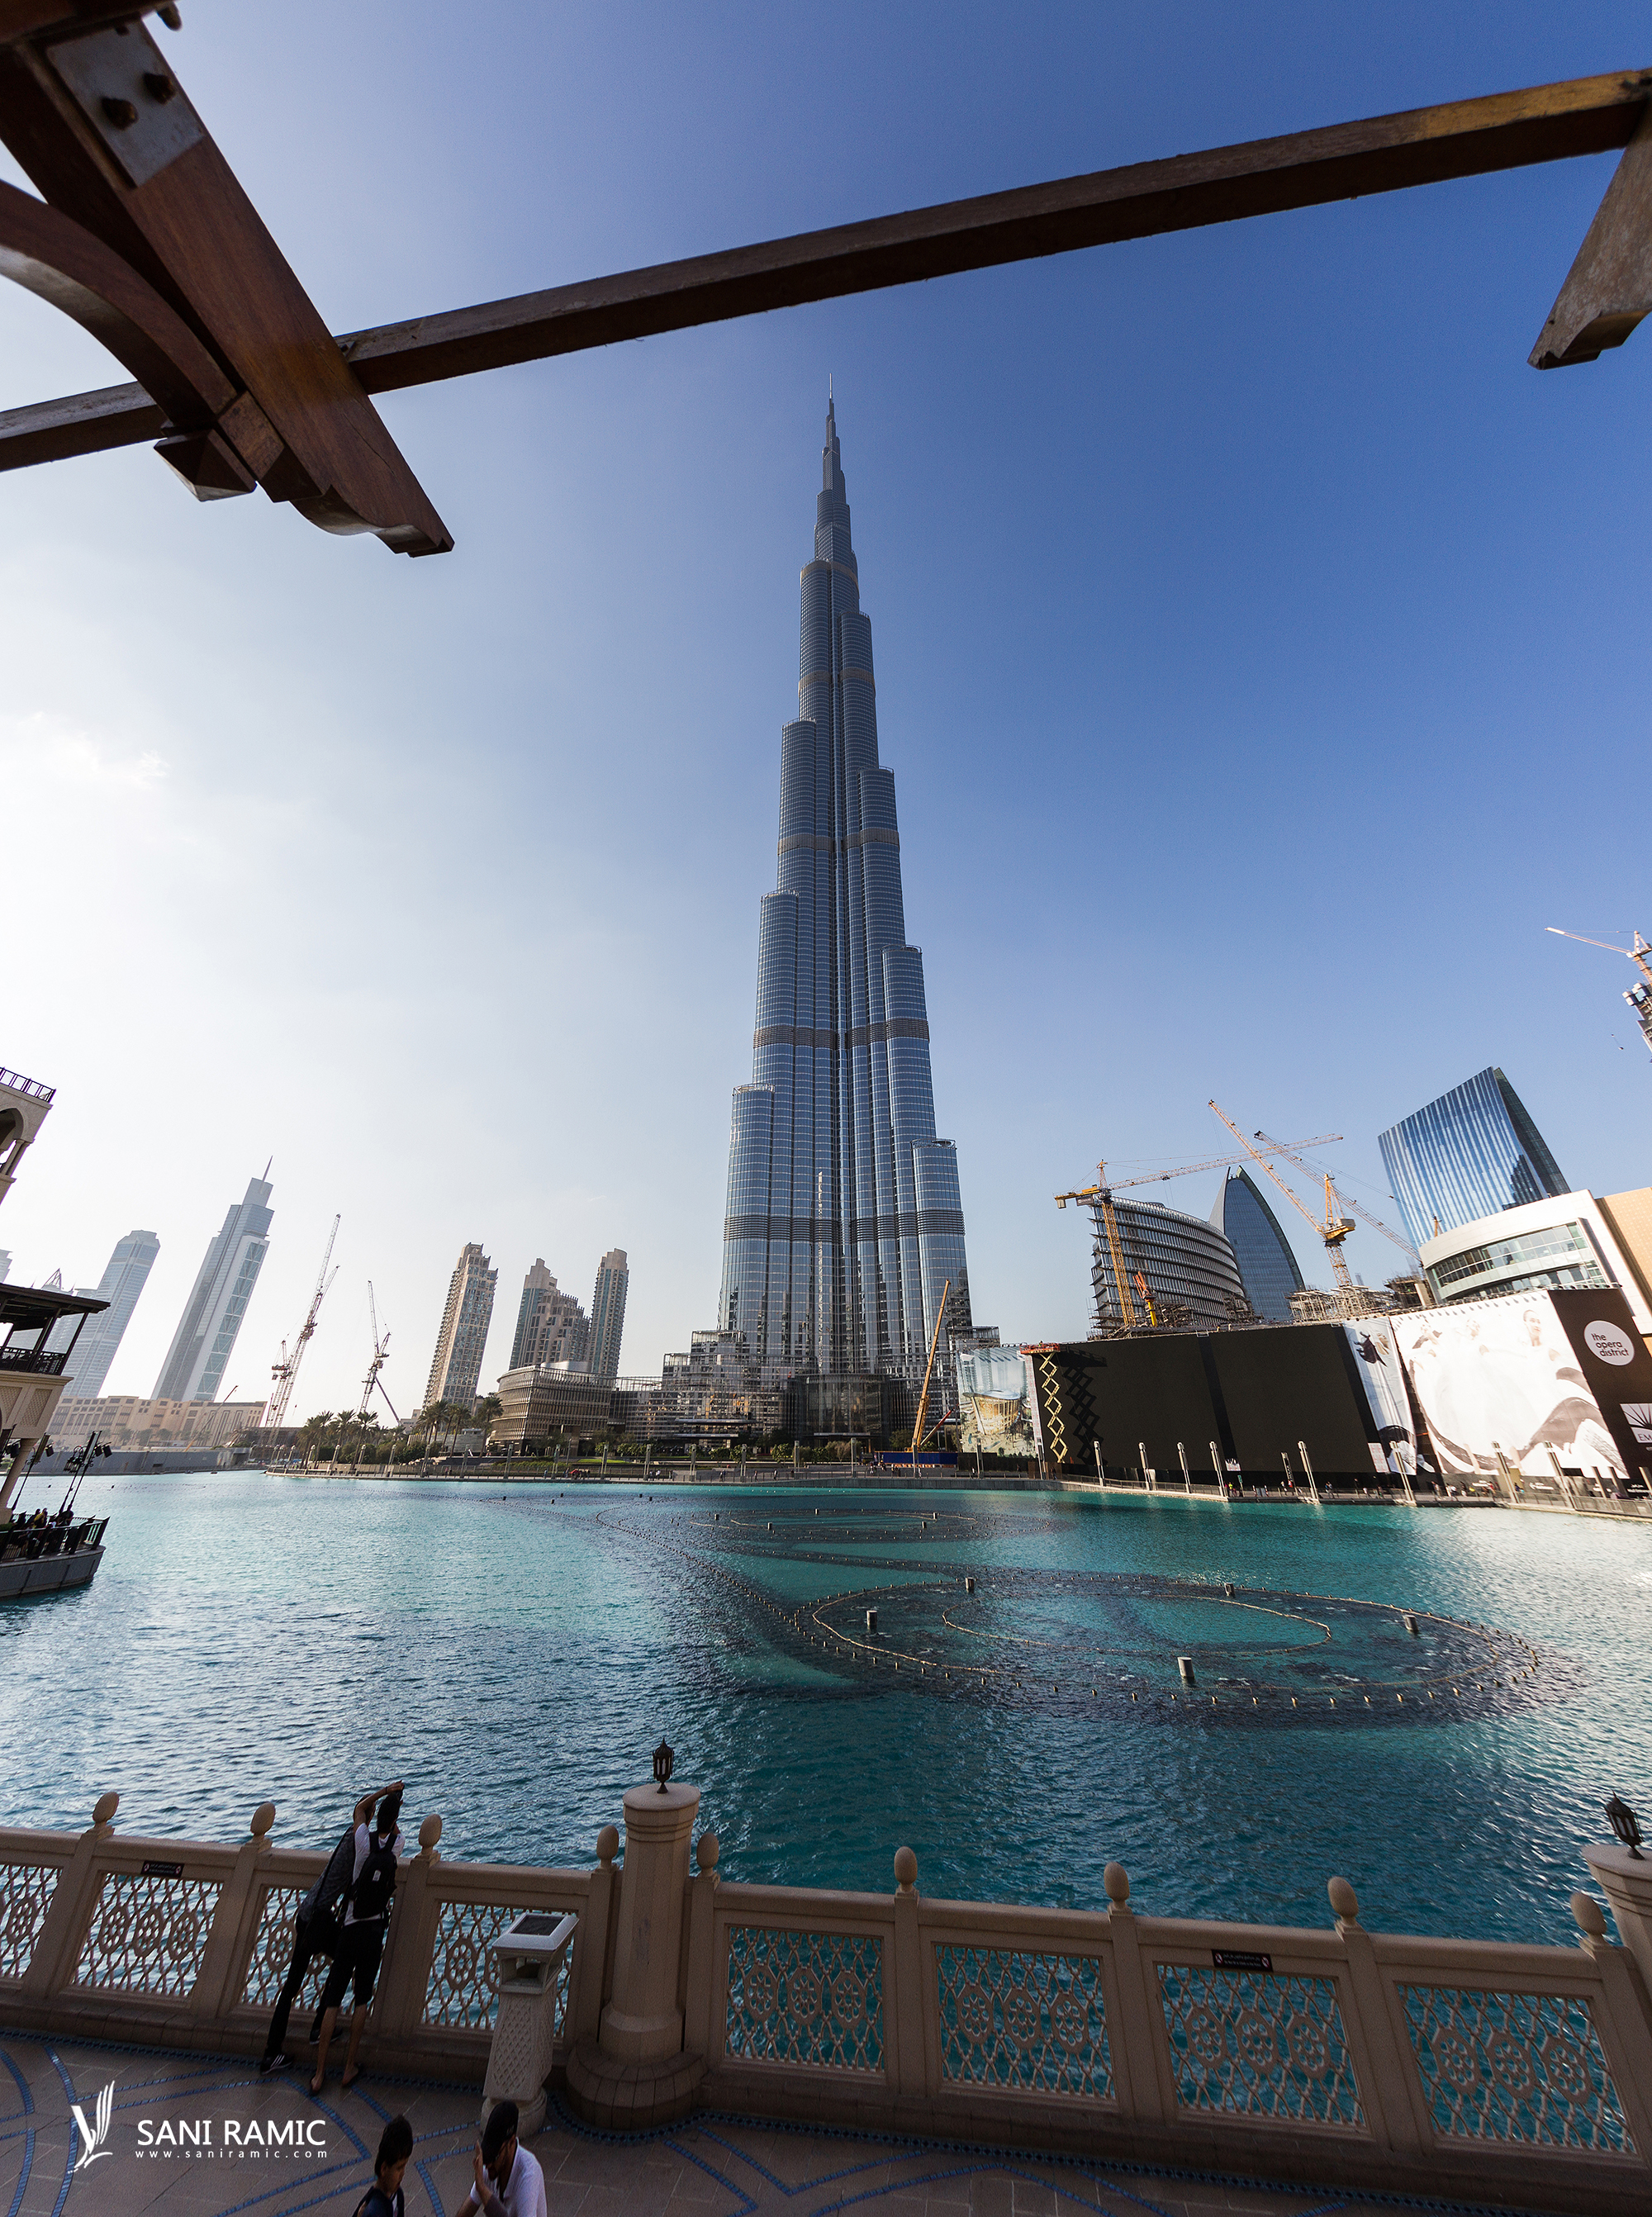 Burj Khalifa The Center of now